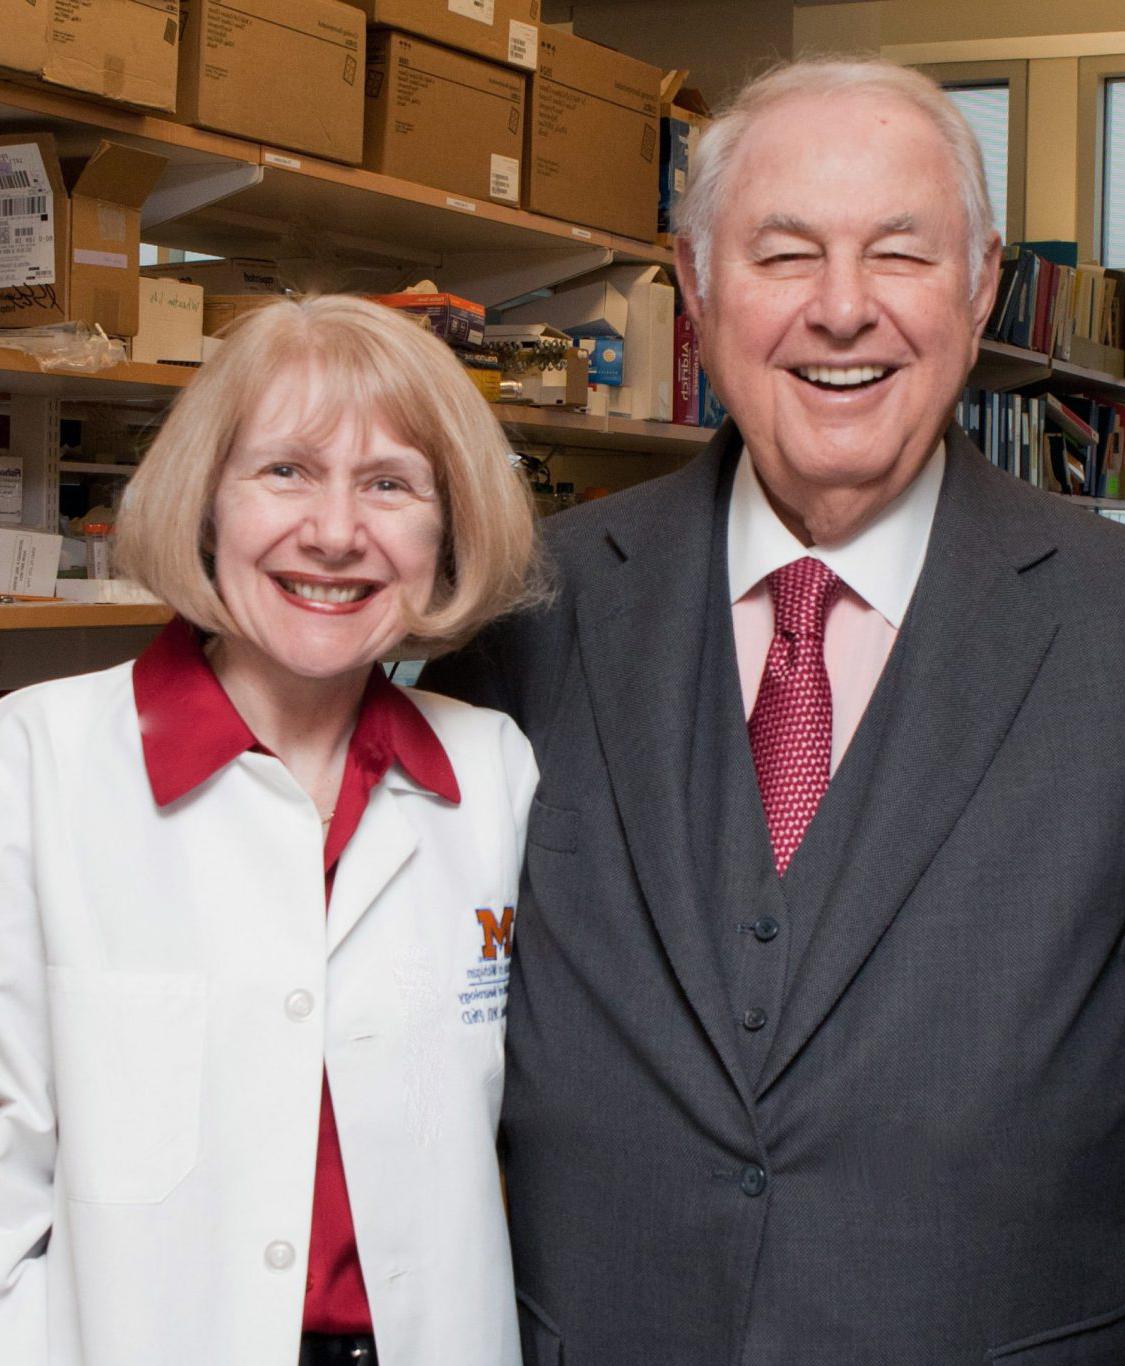 photo of Dr. Eva Feldman and A. Alfred Taubman